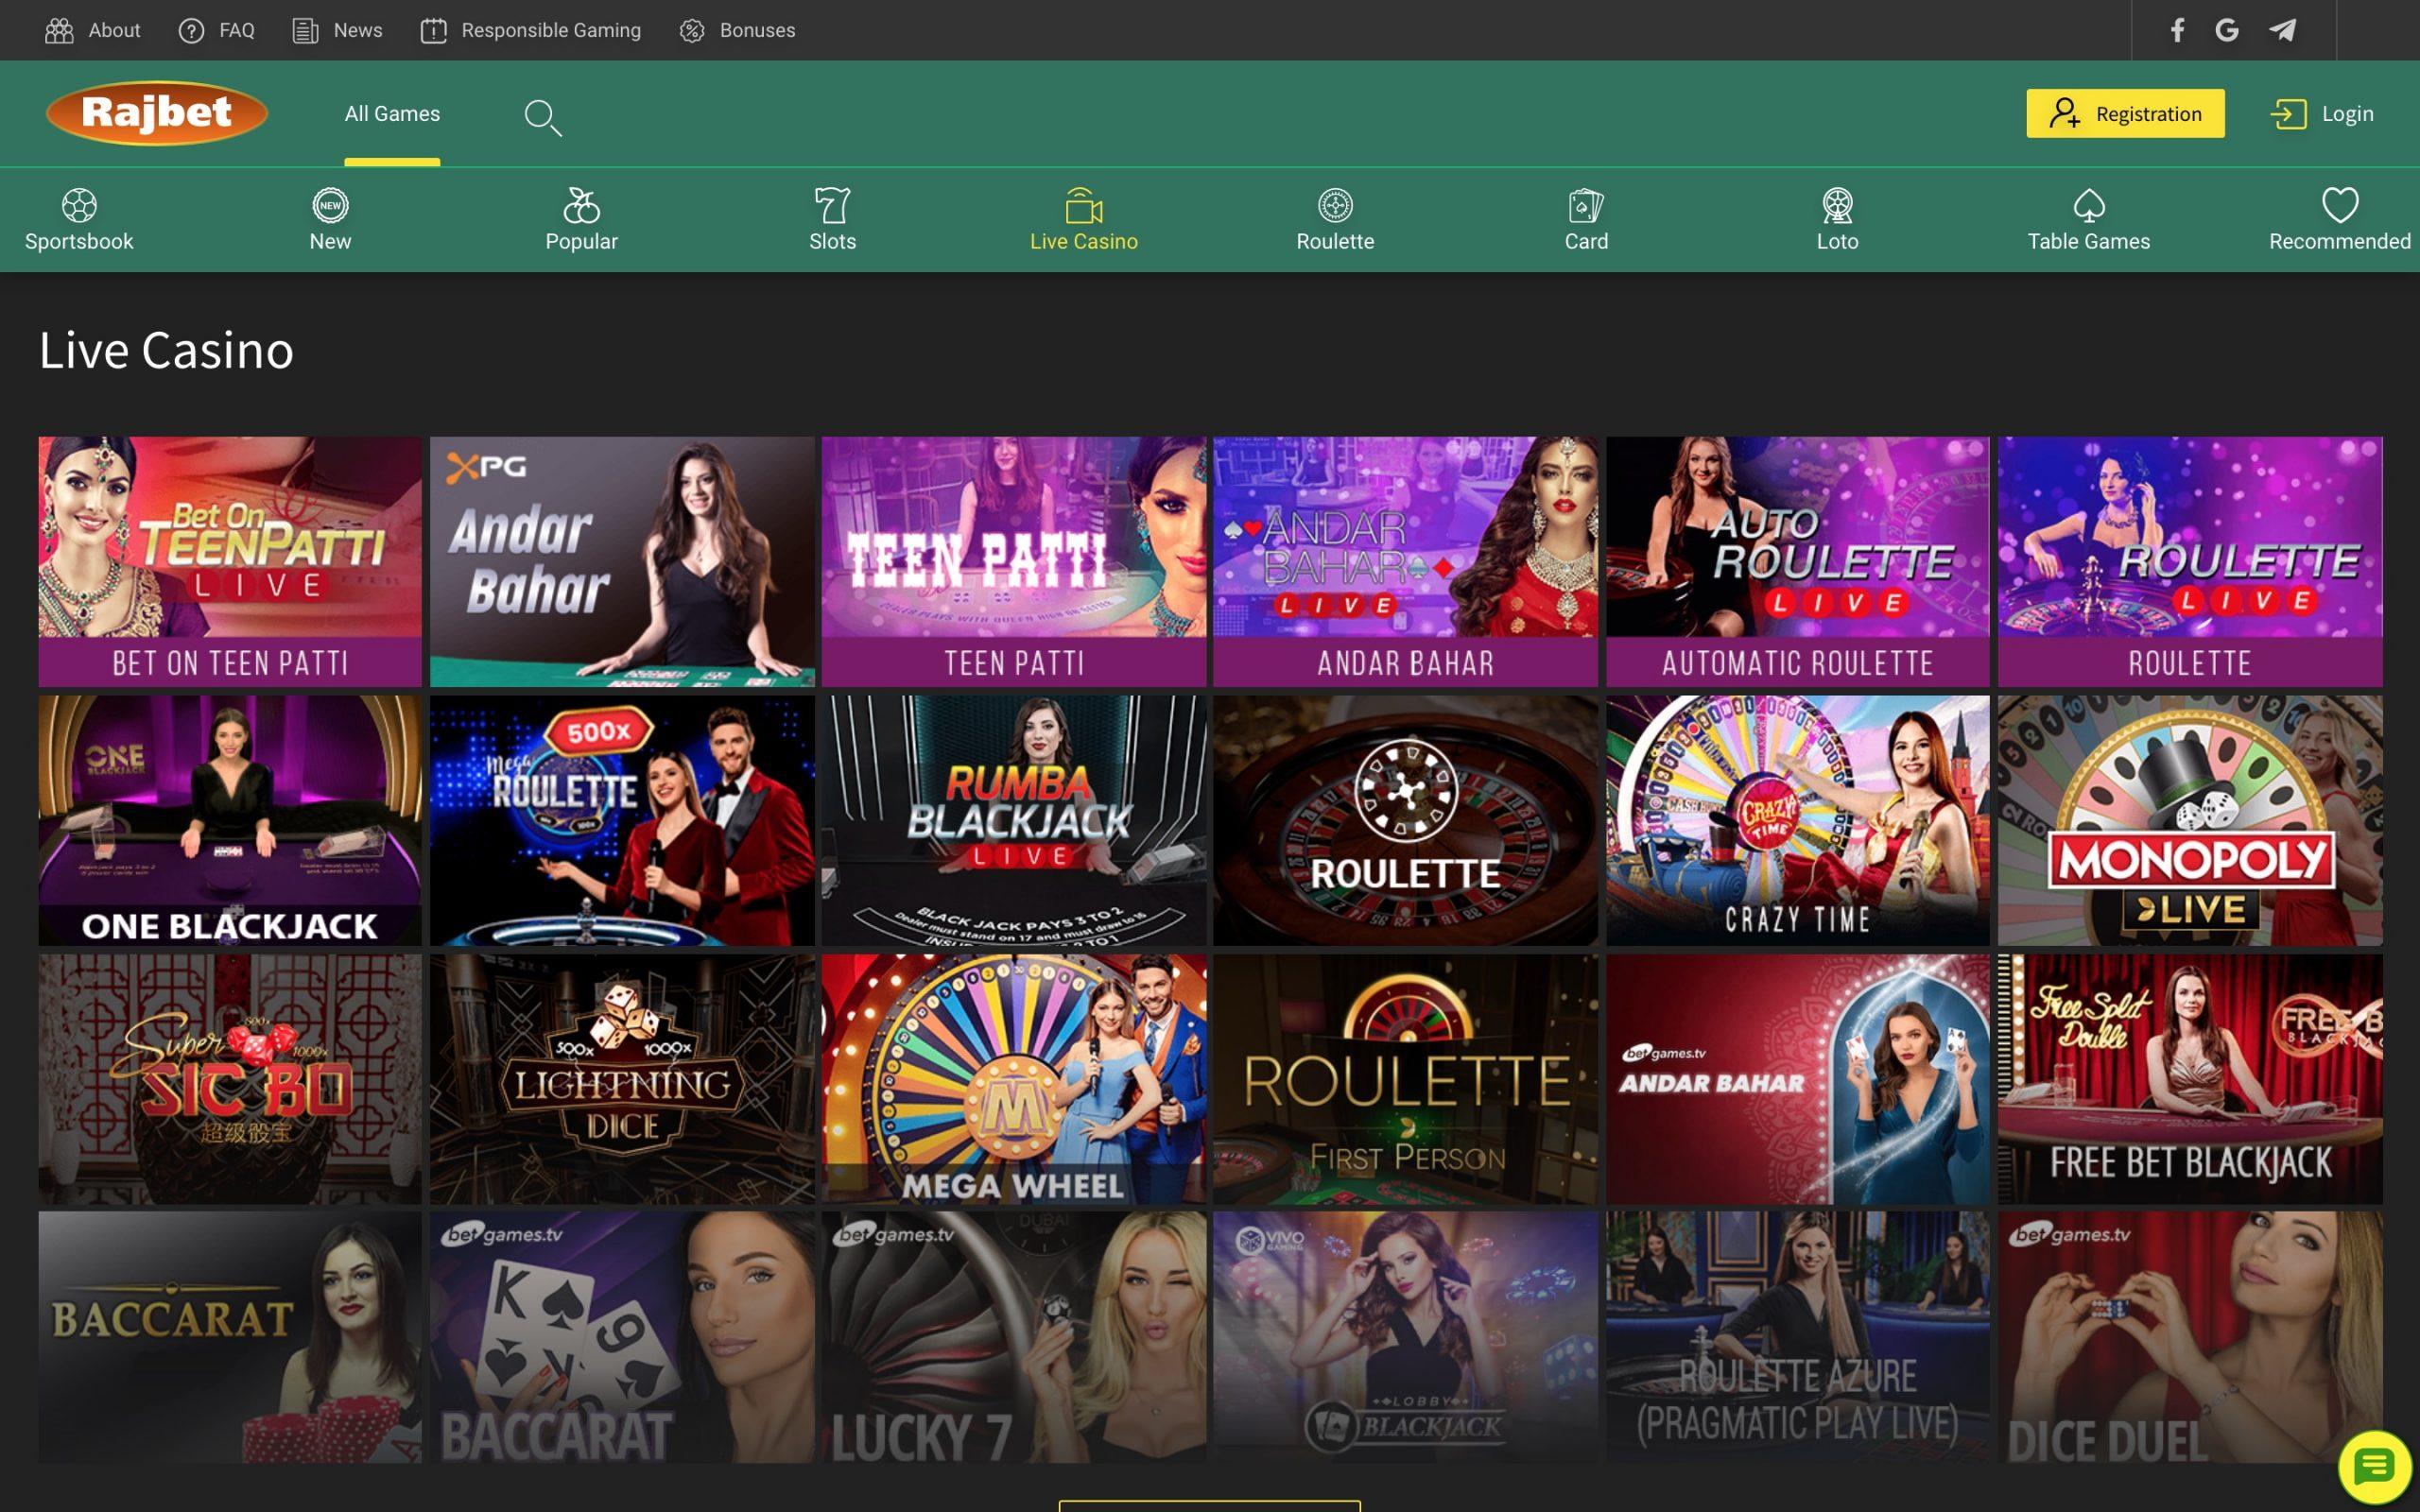 Rajbet live casino